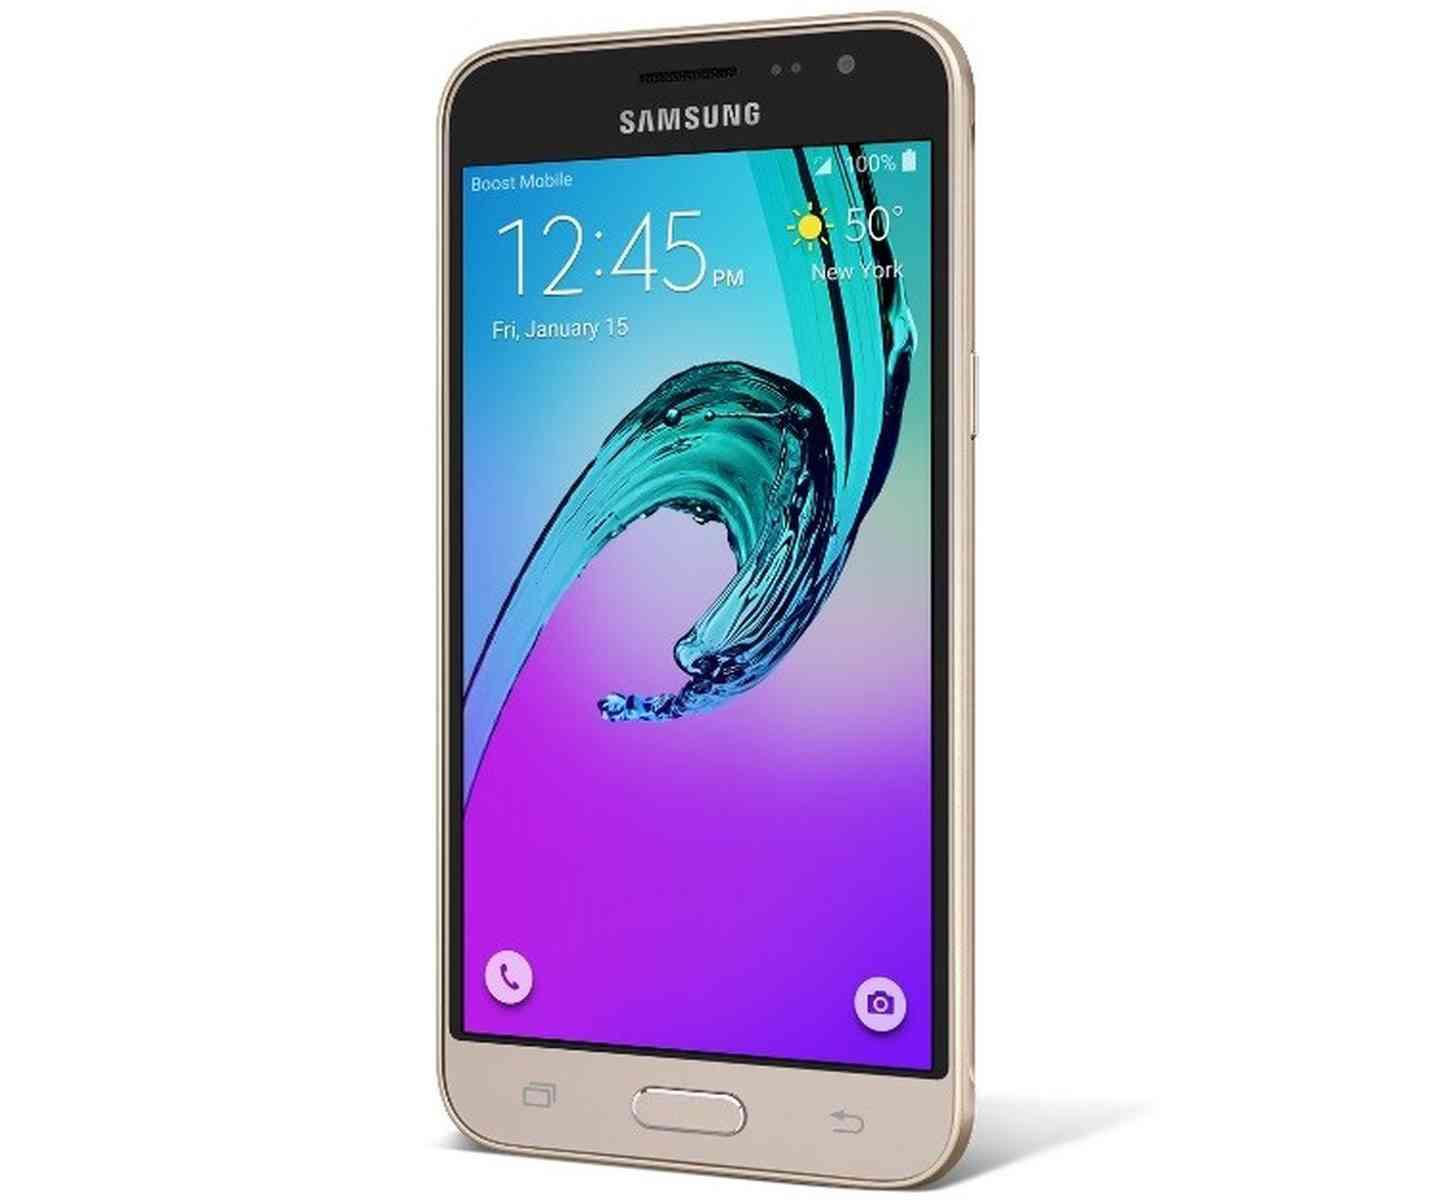 Samsung Galaxy J3 2016 Virgin Mobile, Boost Mobile